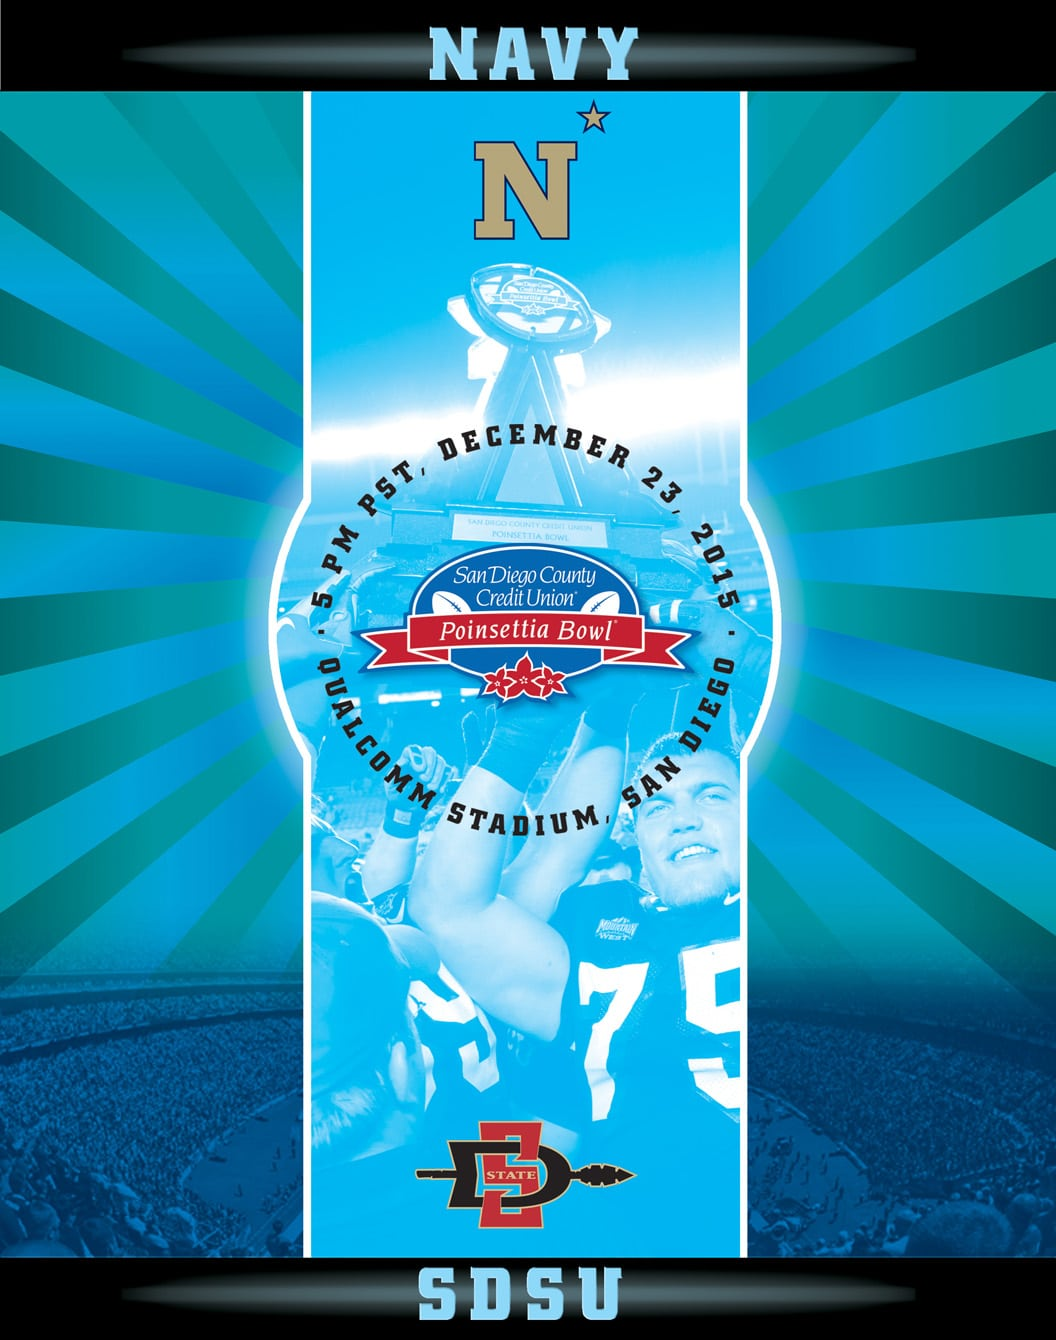 Magazine design, football brochure, professional sports brochure design, entertainment brochure, sports poster design, sports ticket design, publication design, football advertisement design